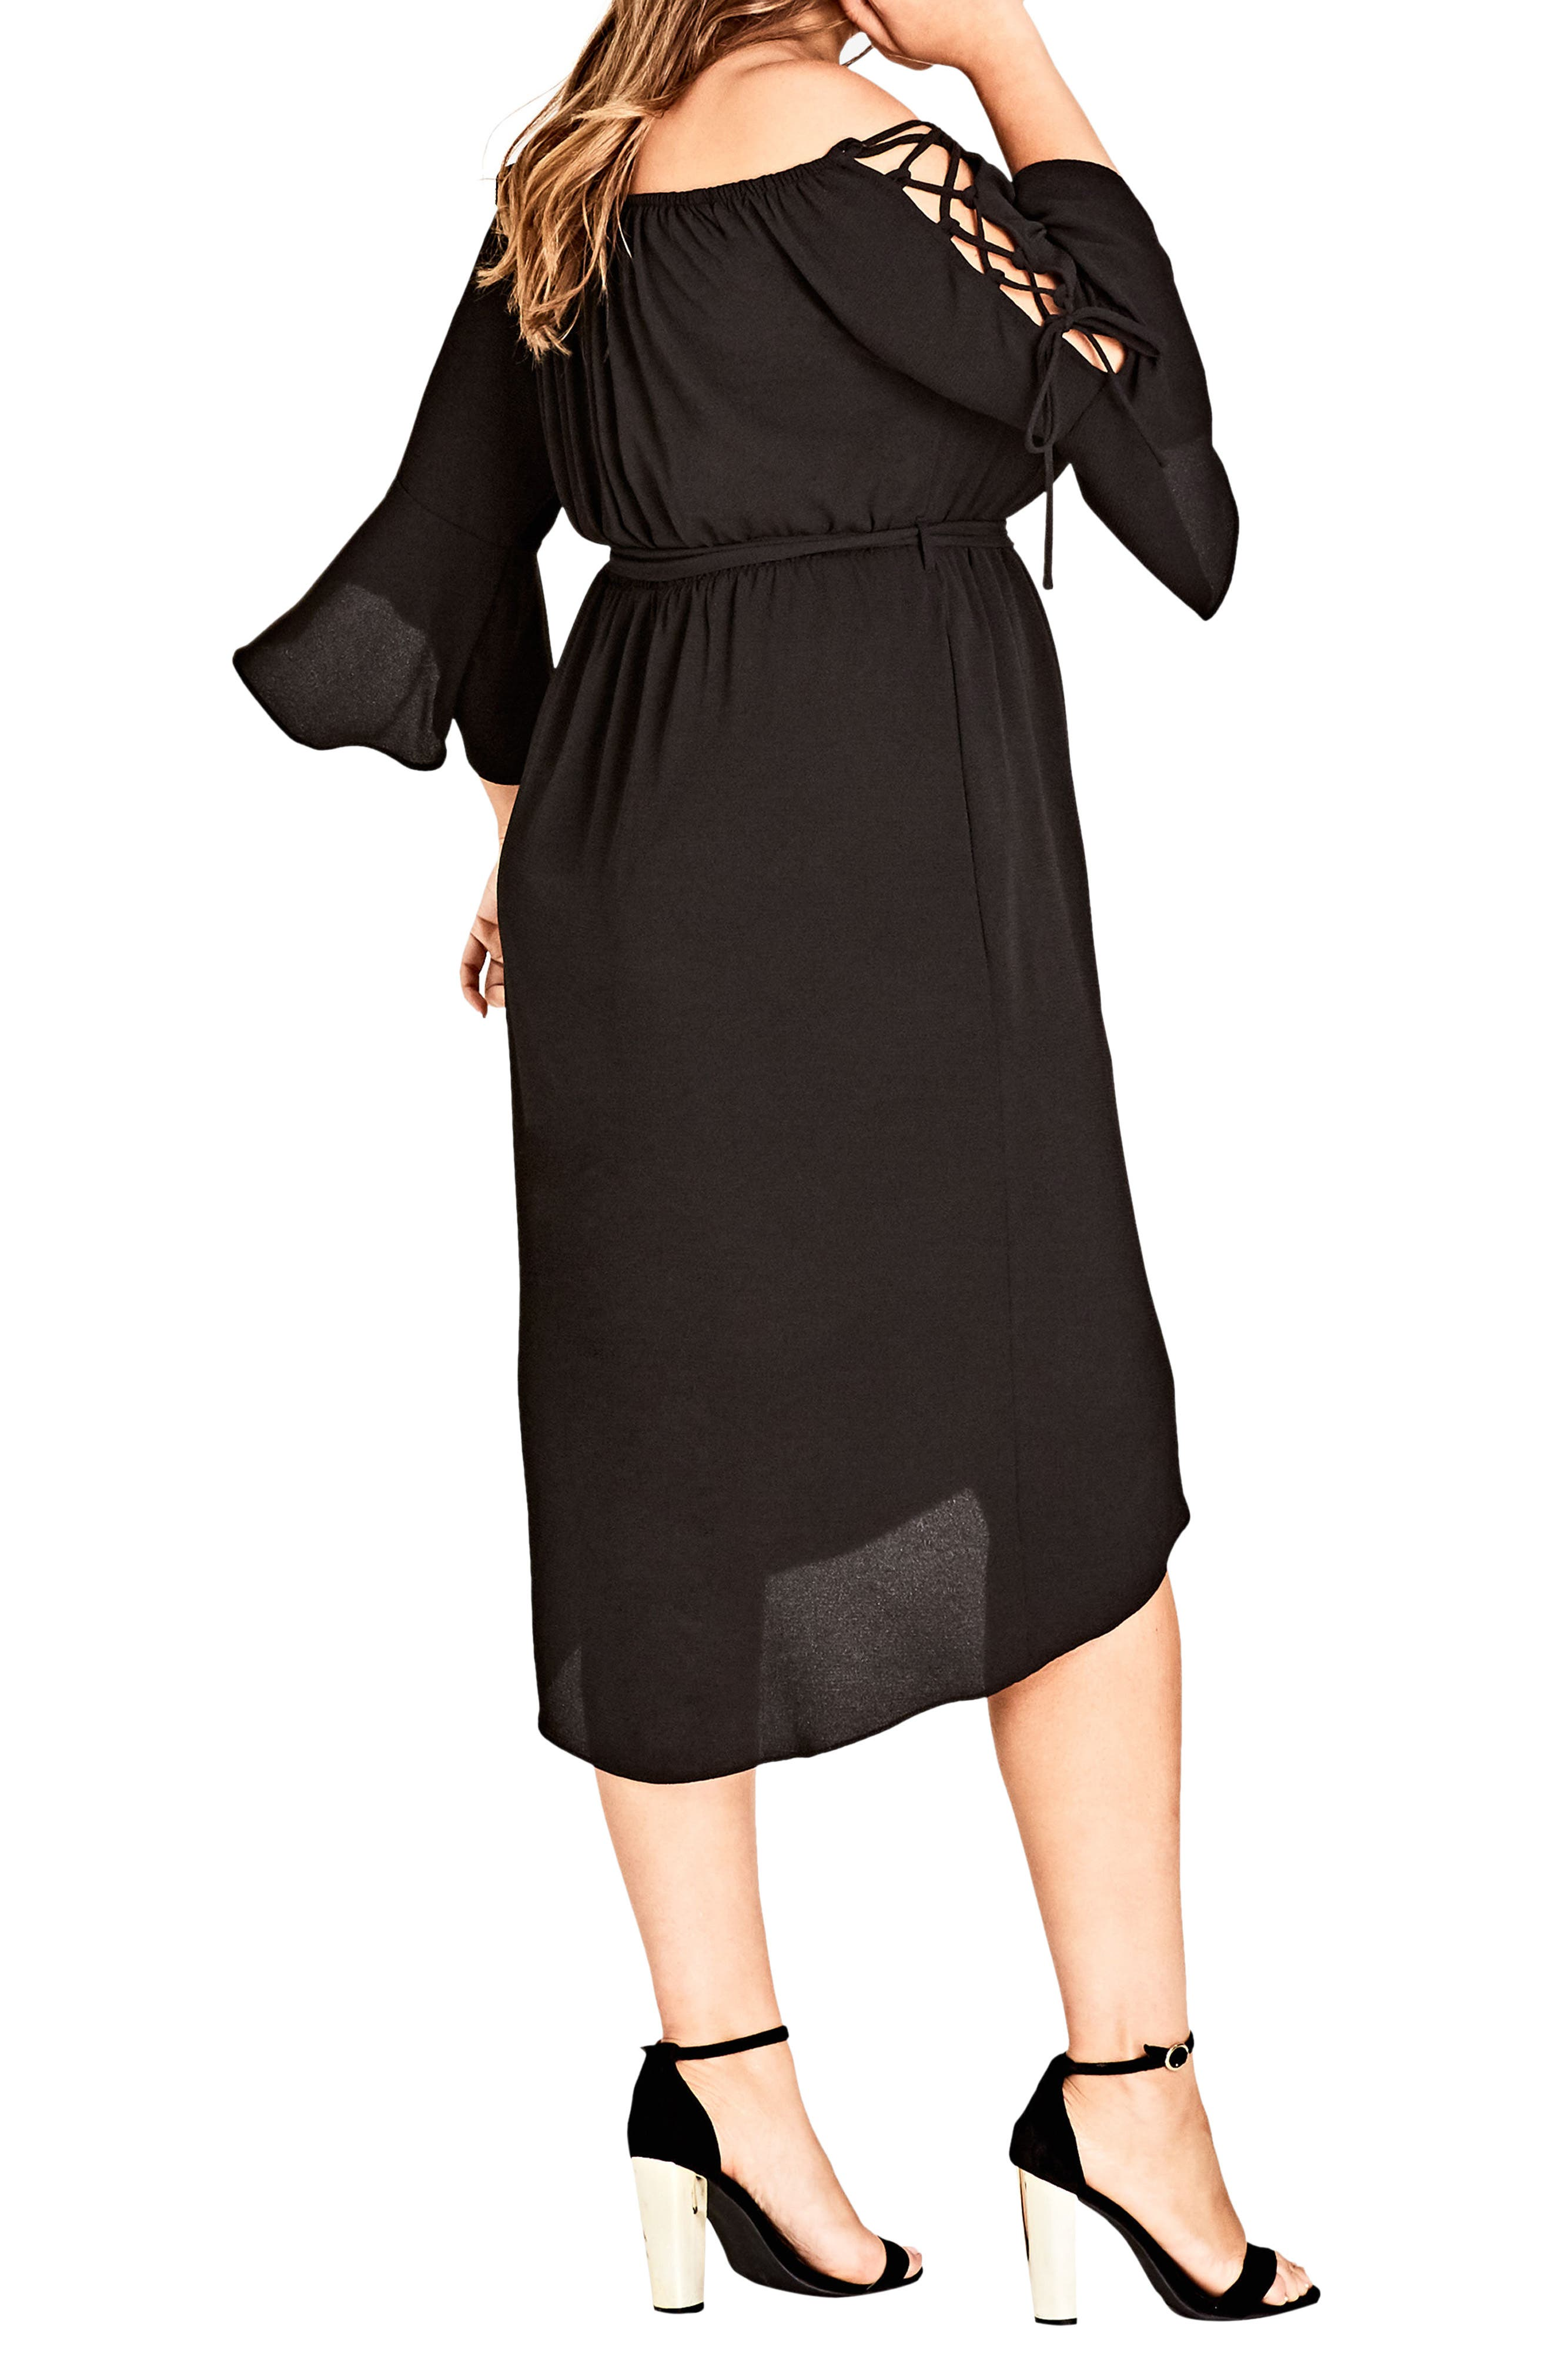 Lace Bell Sleeve Off the Shoulder Midi Dress,                             Alternate thumbnail 2, color,                             Black